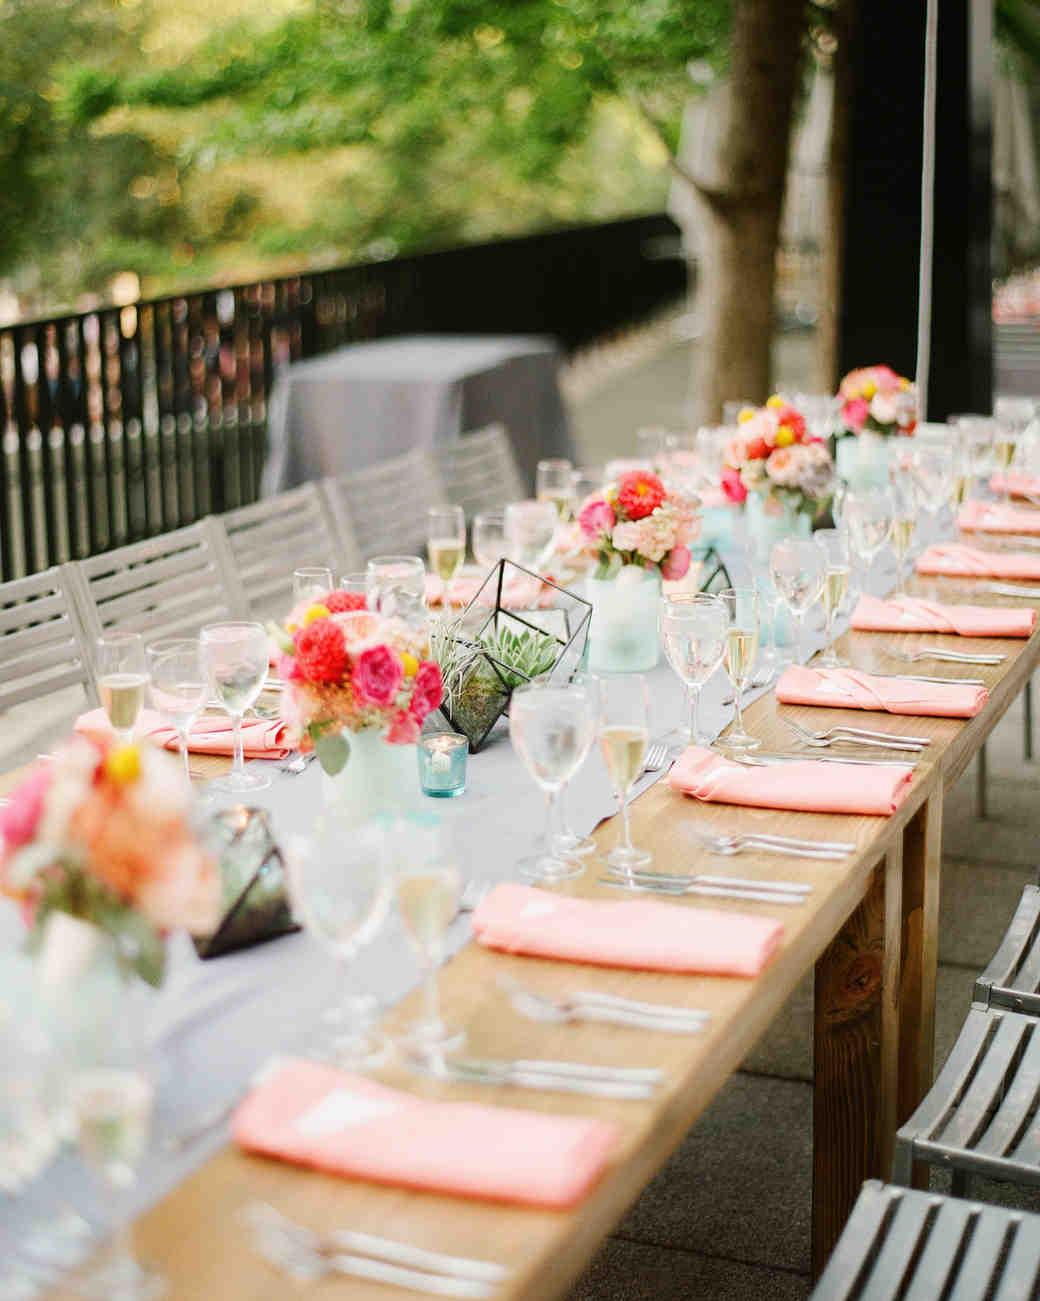 christina-jimmy-wedding-tables-8053.jpg